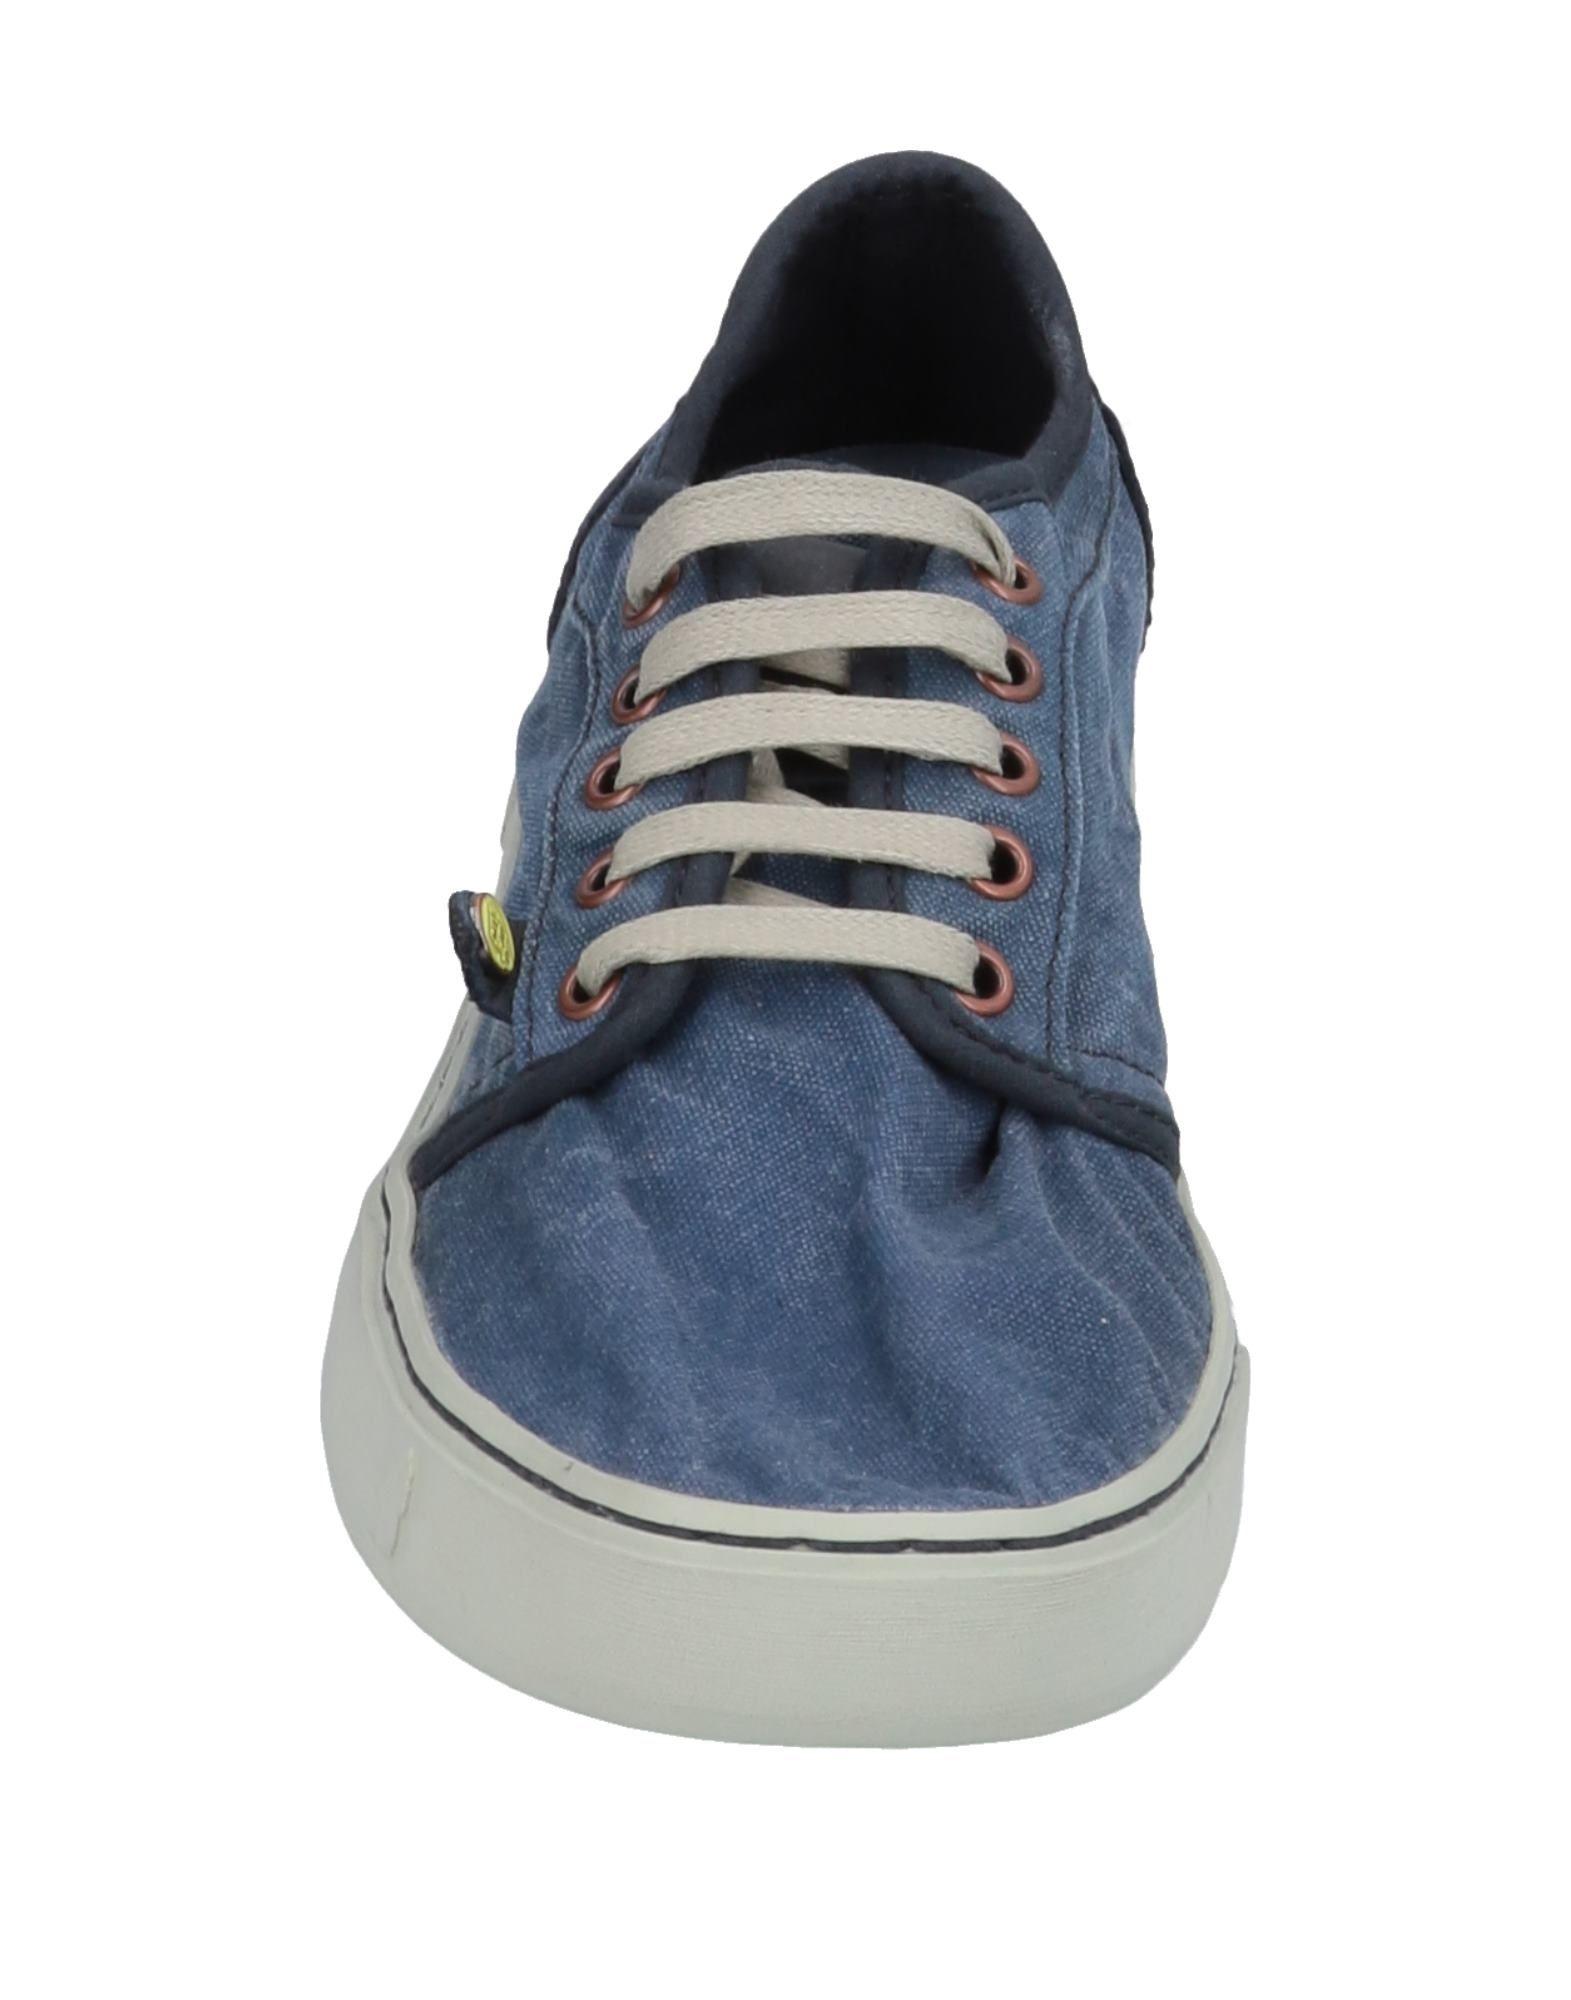 Rabatt Herren echte Schuhe Satorisan Sneakers Herren Rabatt  11554099OB 8b86ab